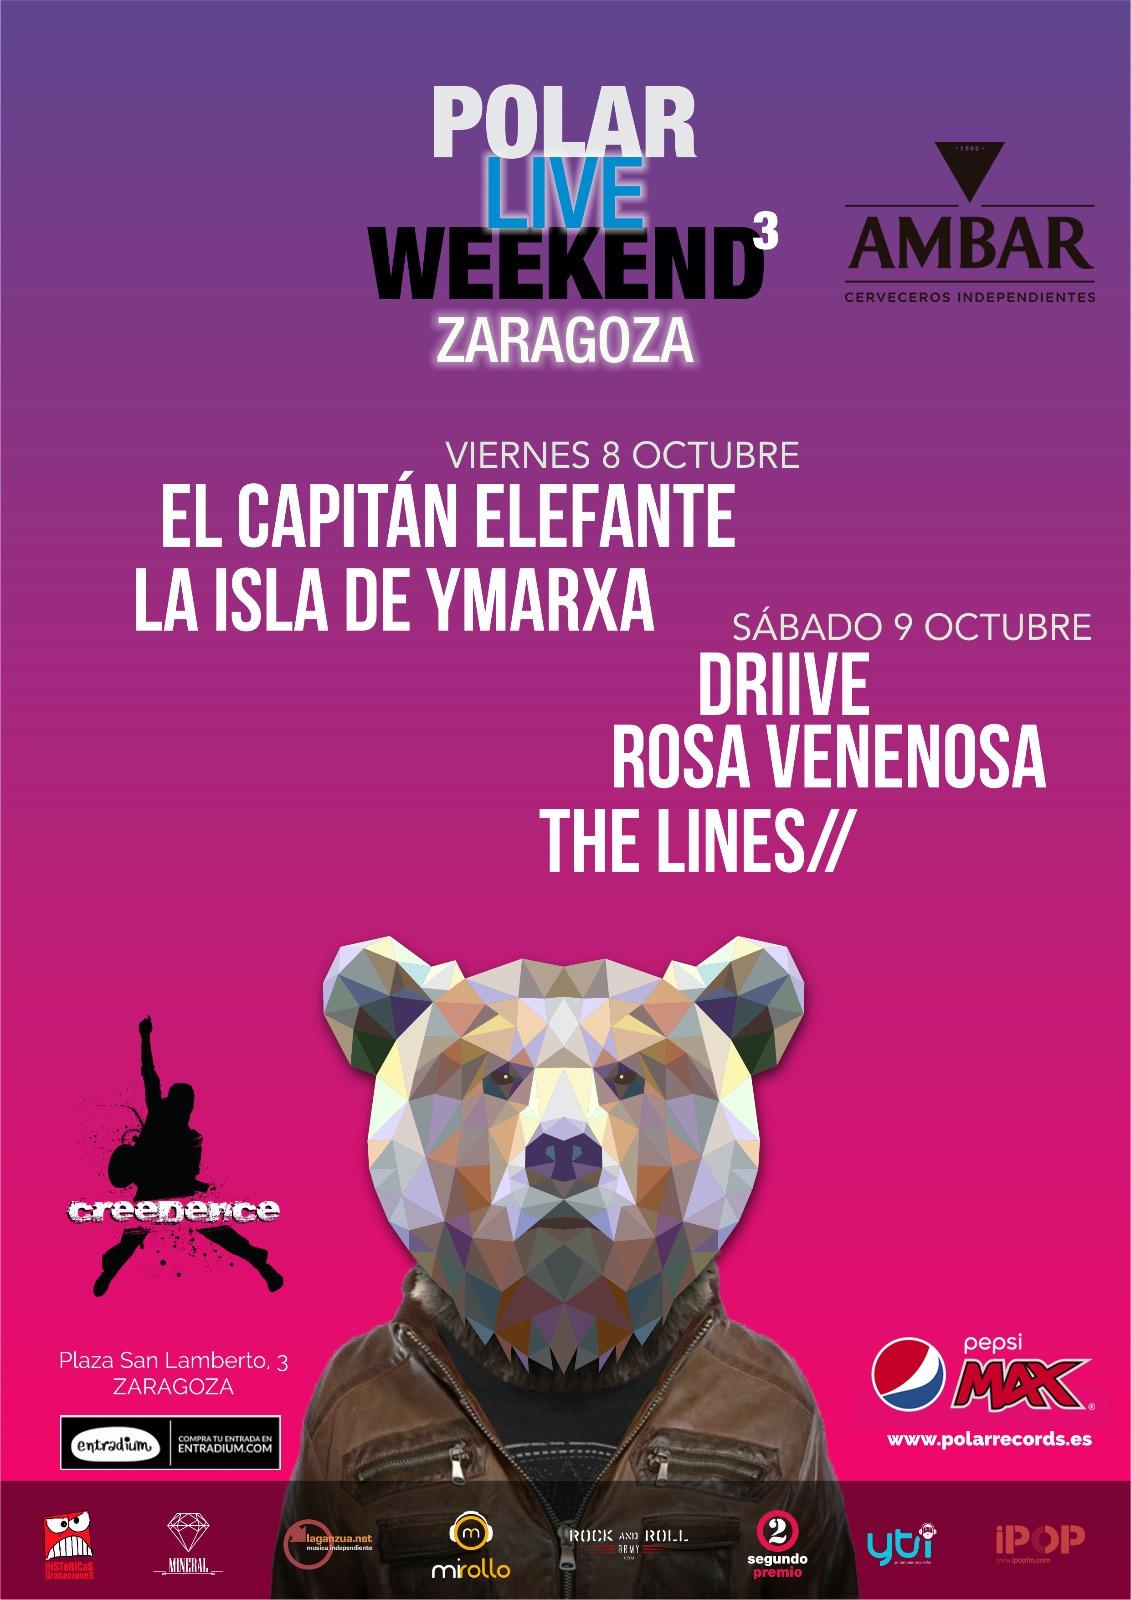 Polar-Live-Weekend.-Sala-Creedence-Zaragoza